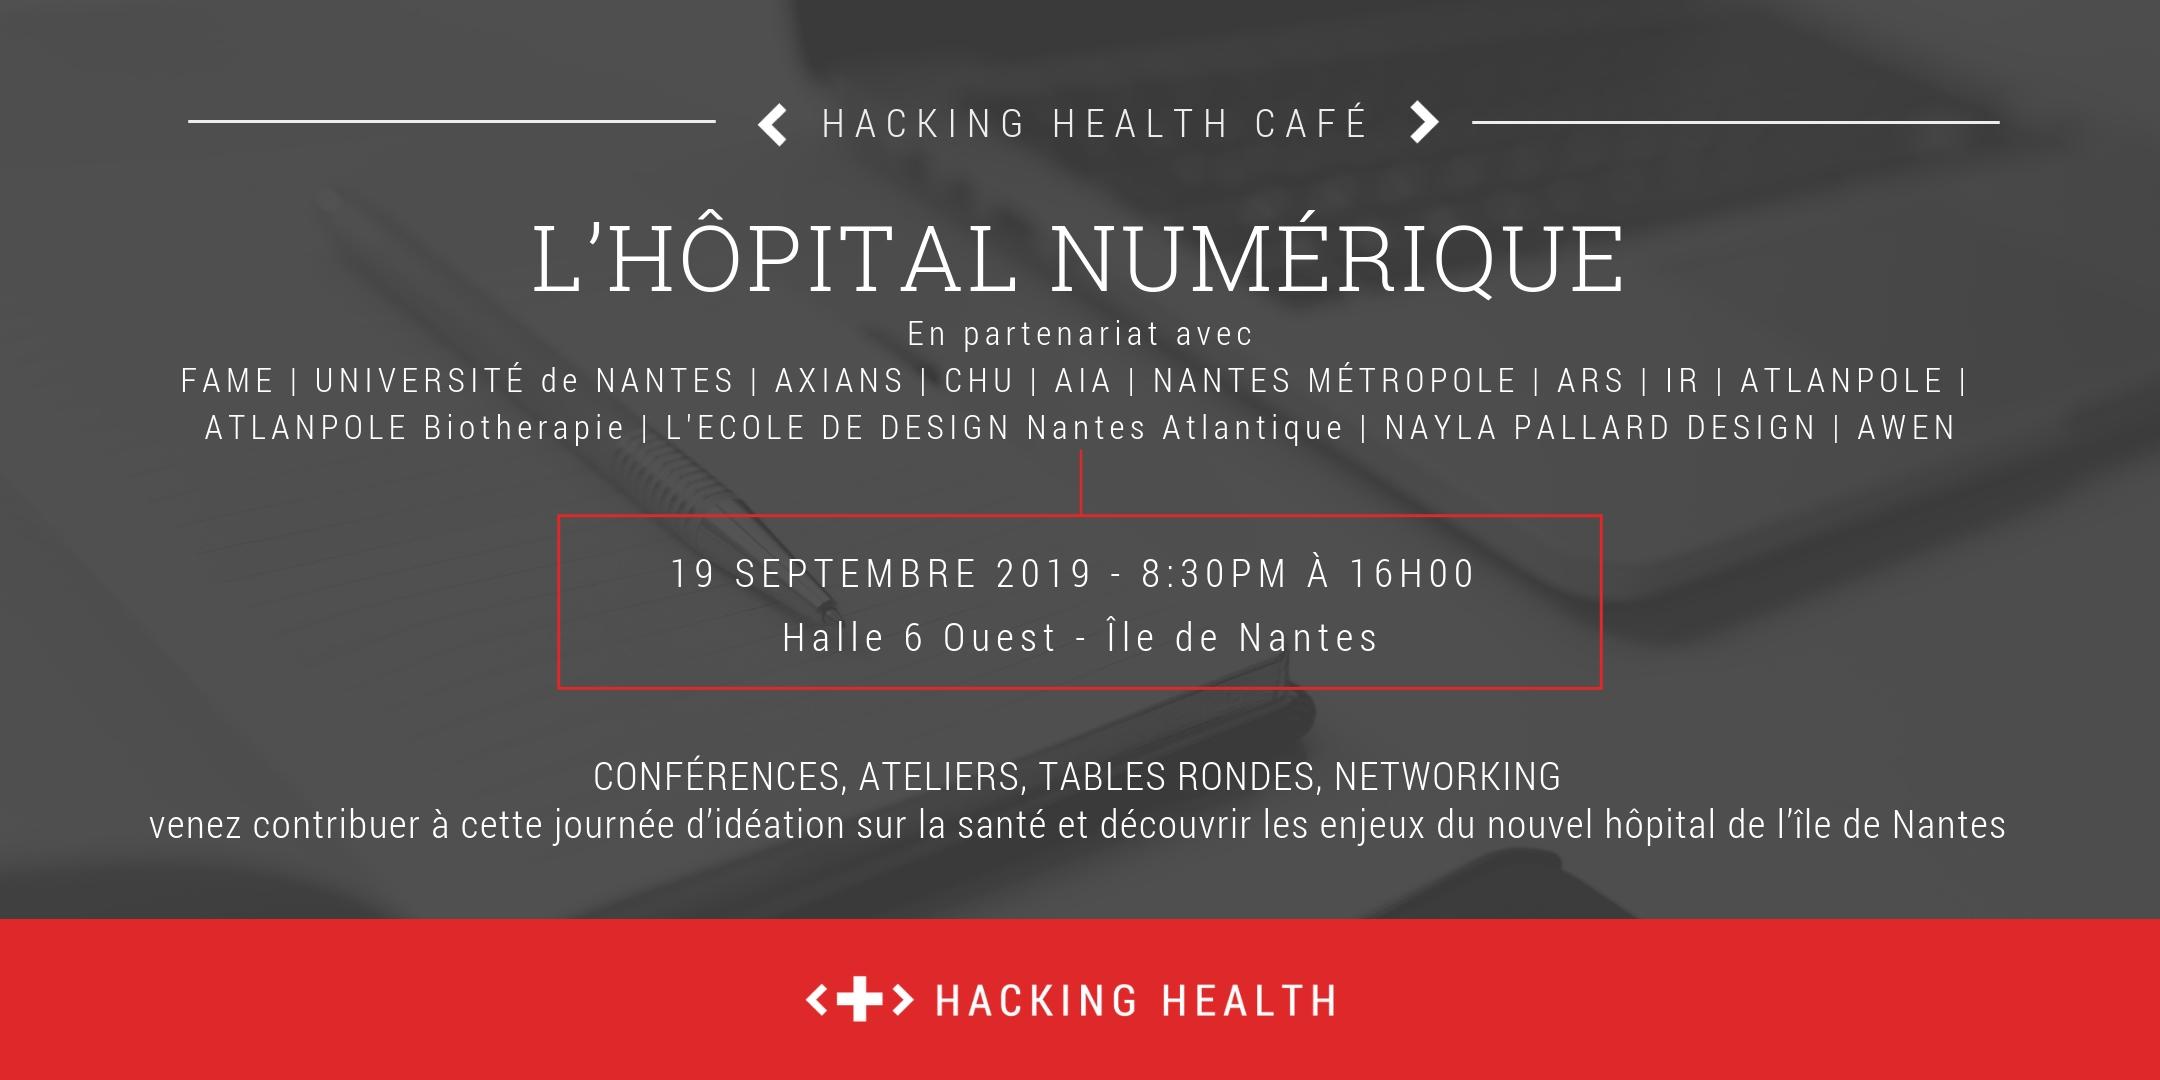 Hopital-numerique-digital-week-2019 | HH Nantes